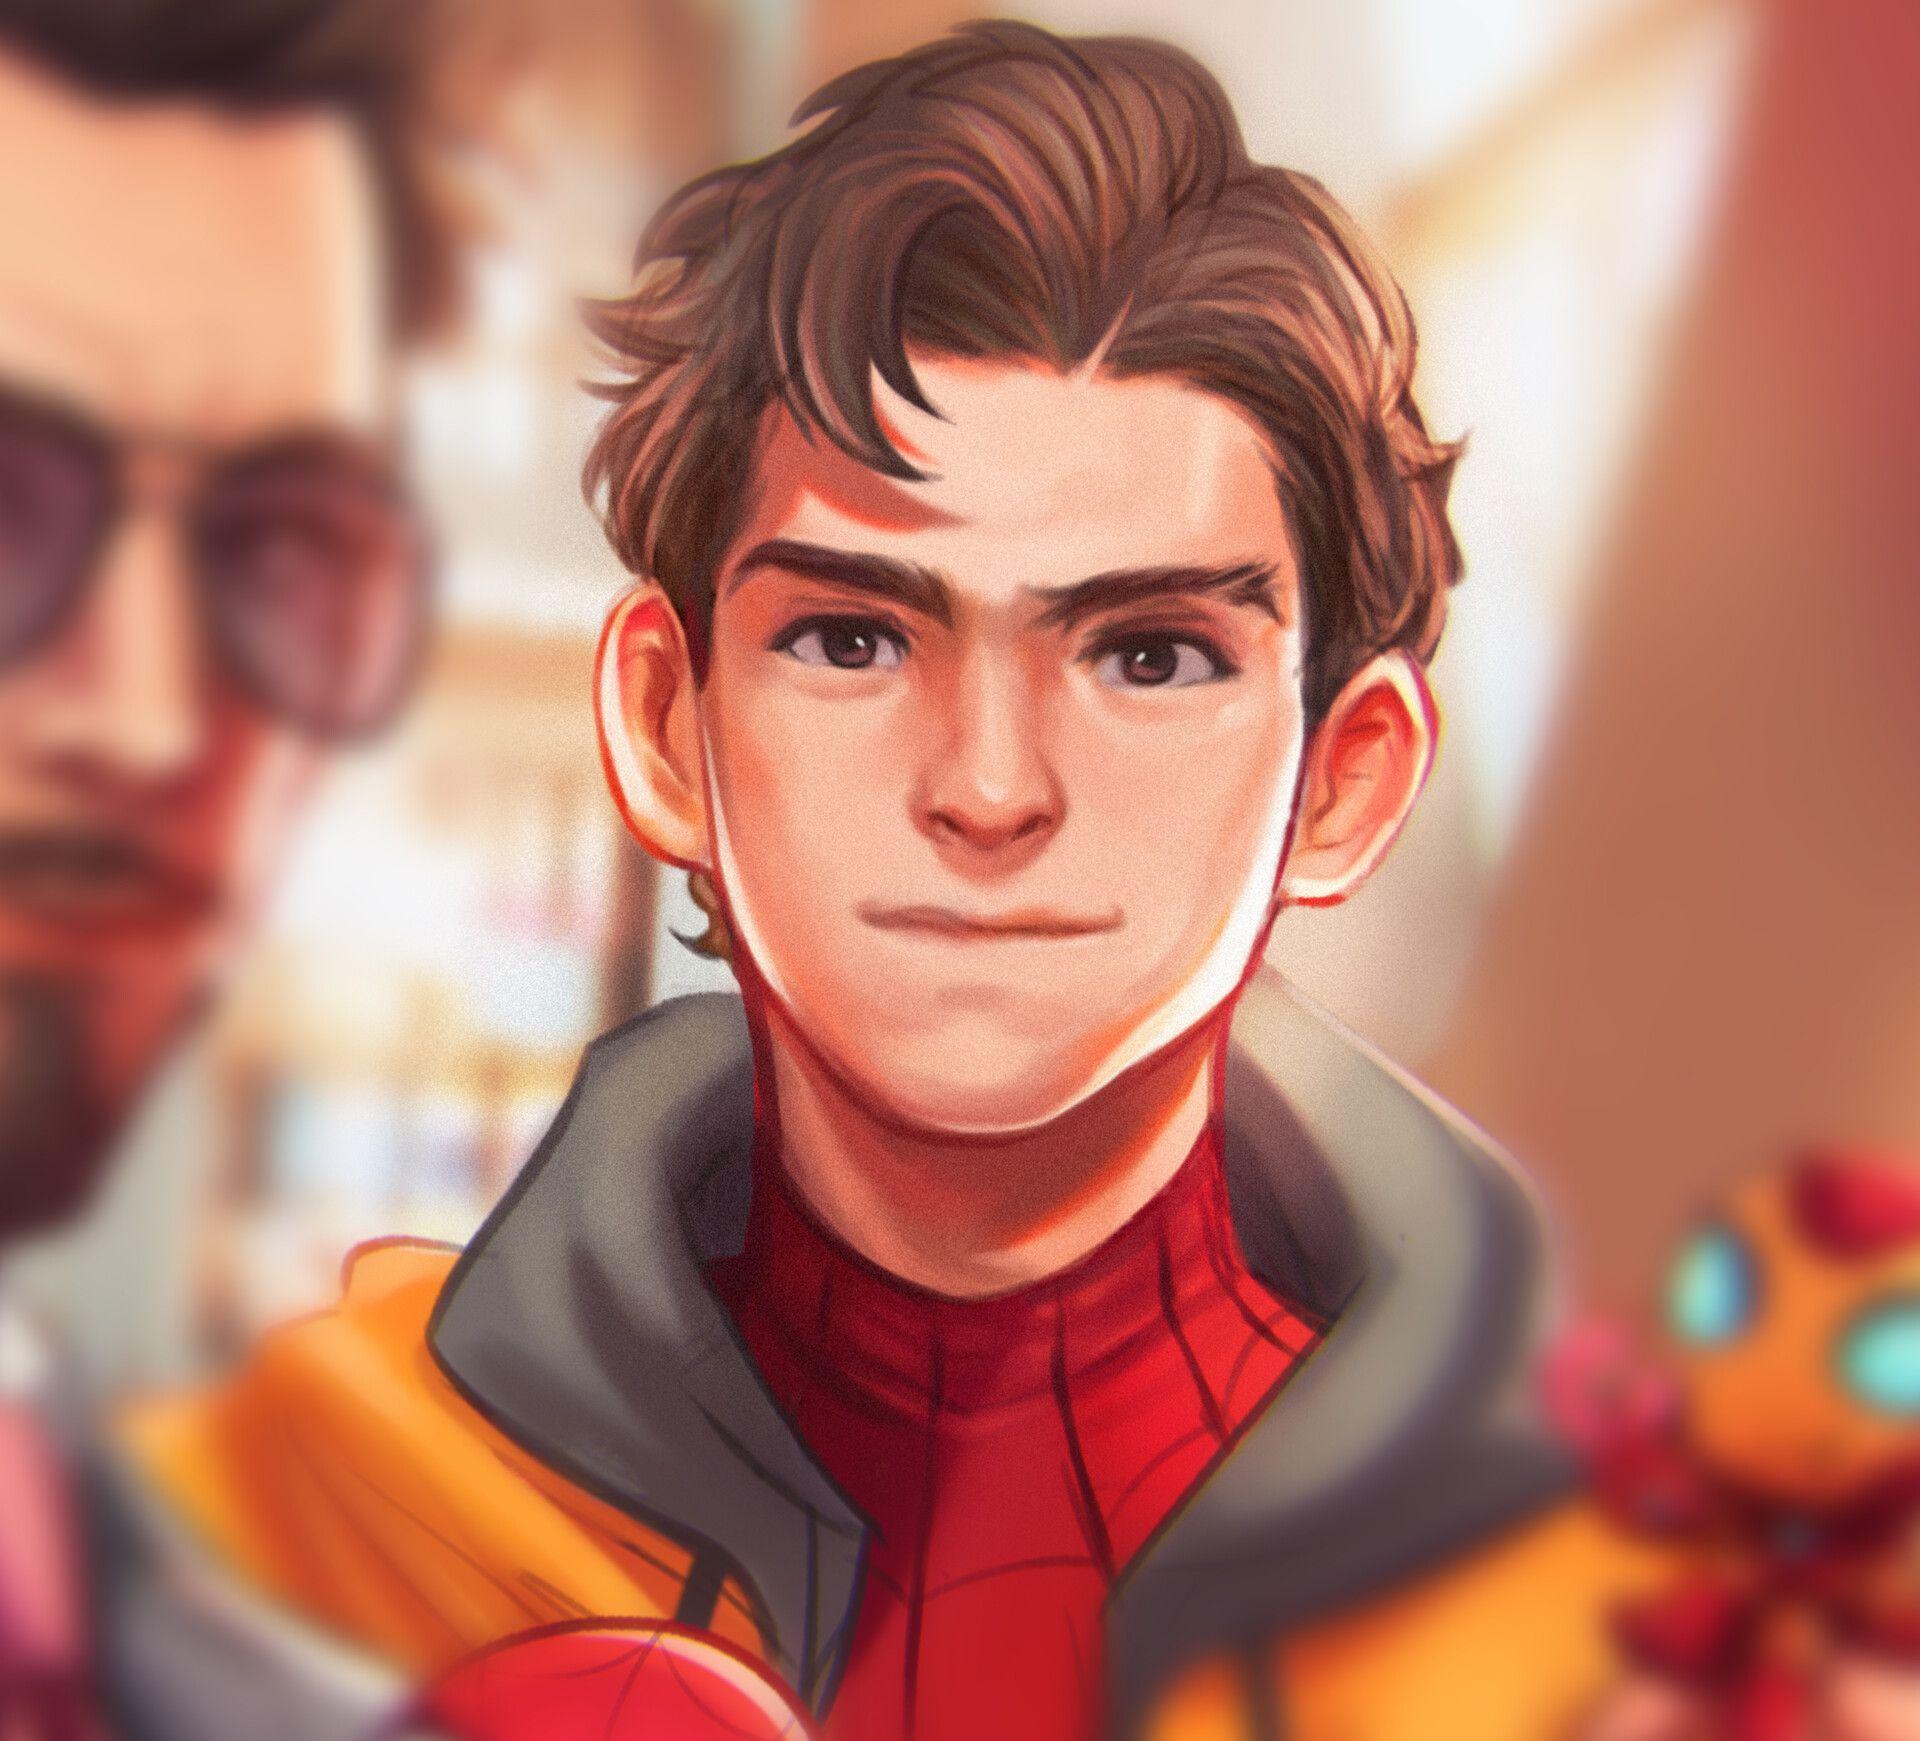 Tony Stark w/ Peter Parker , Veedles ✨ #peterparker